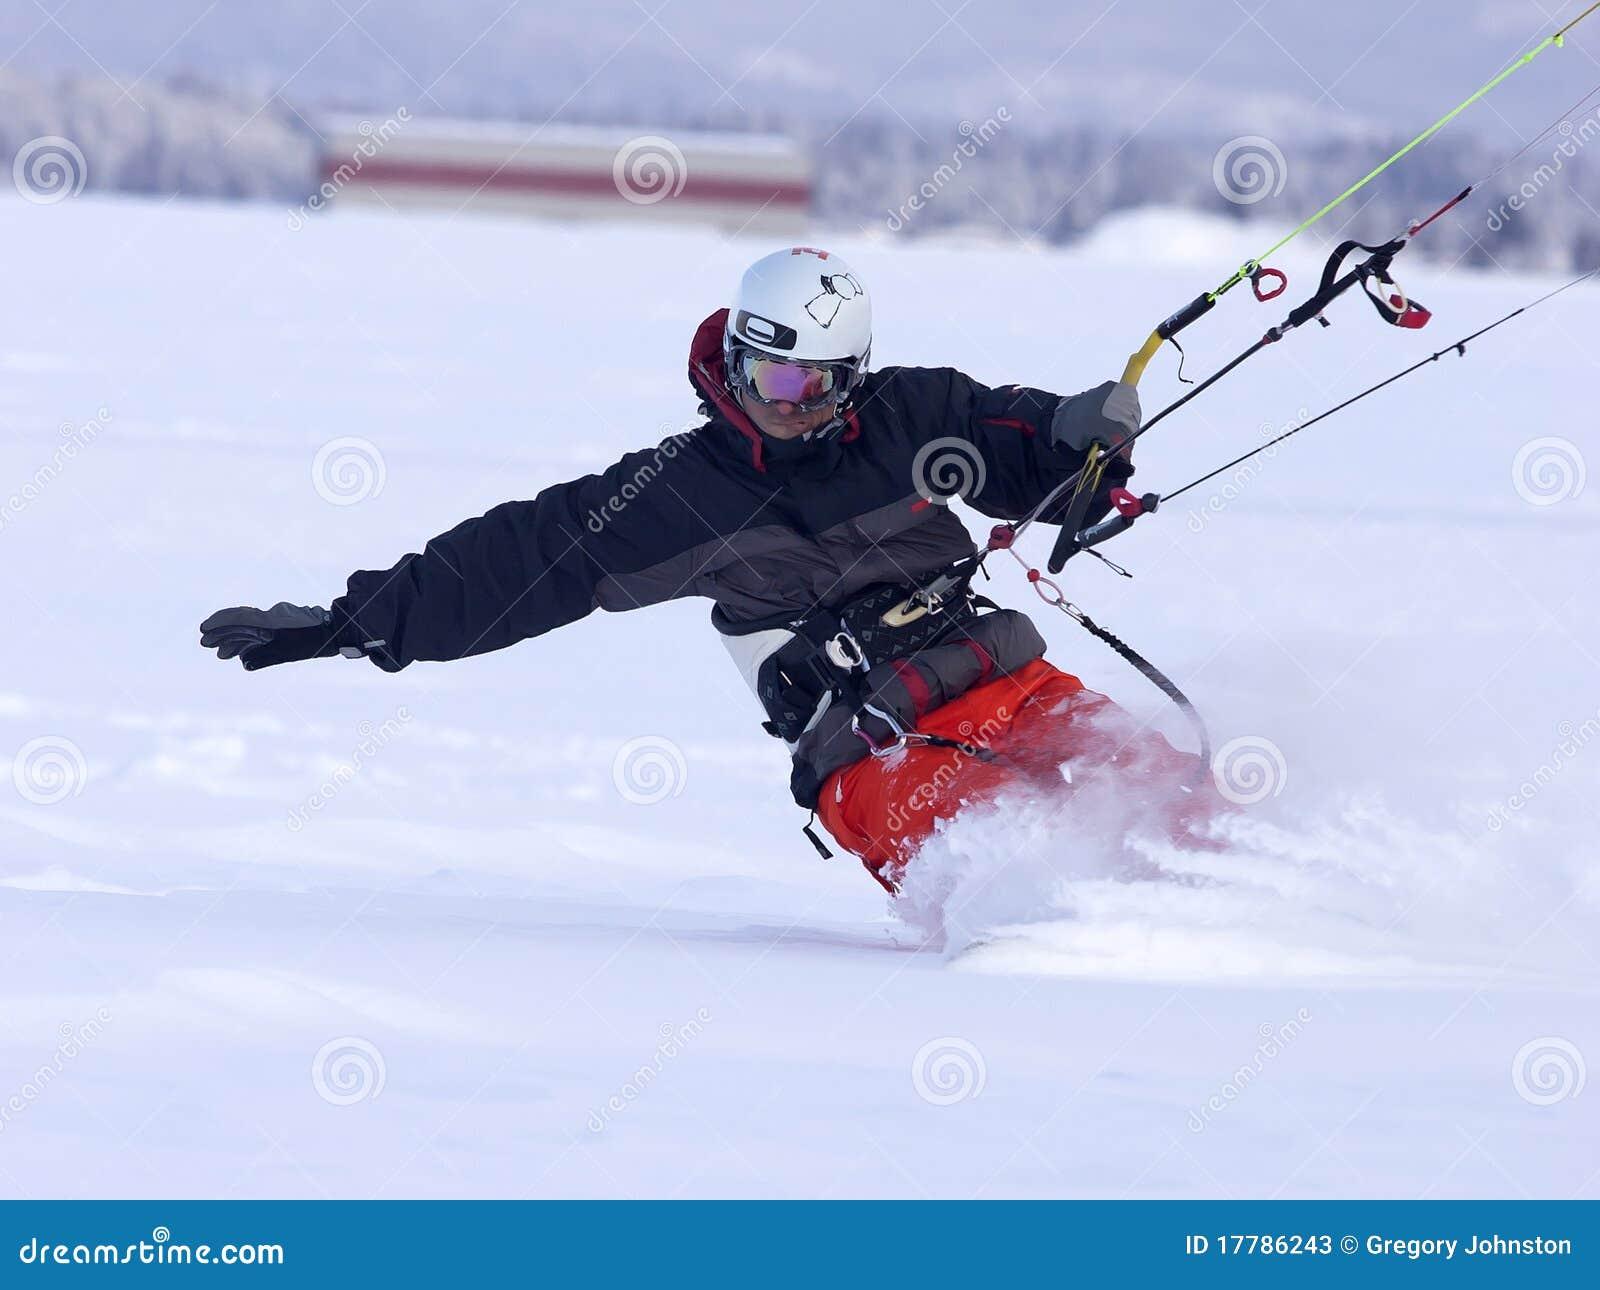 Shredding On A Snowboard. Stock Photos - Image: 17786243 Shredding Snow